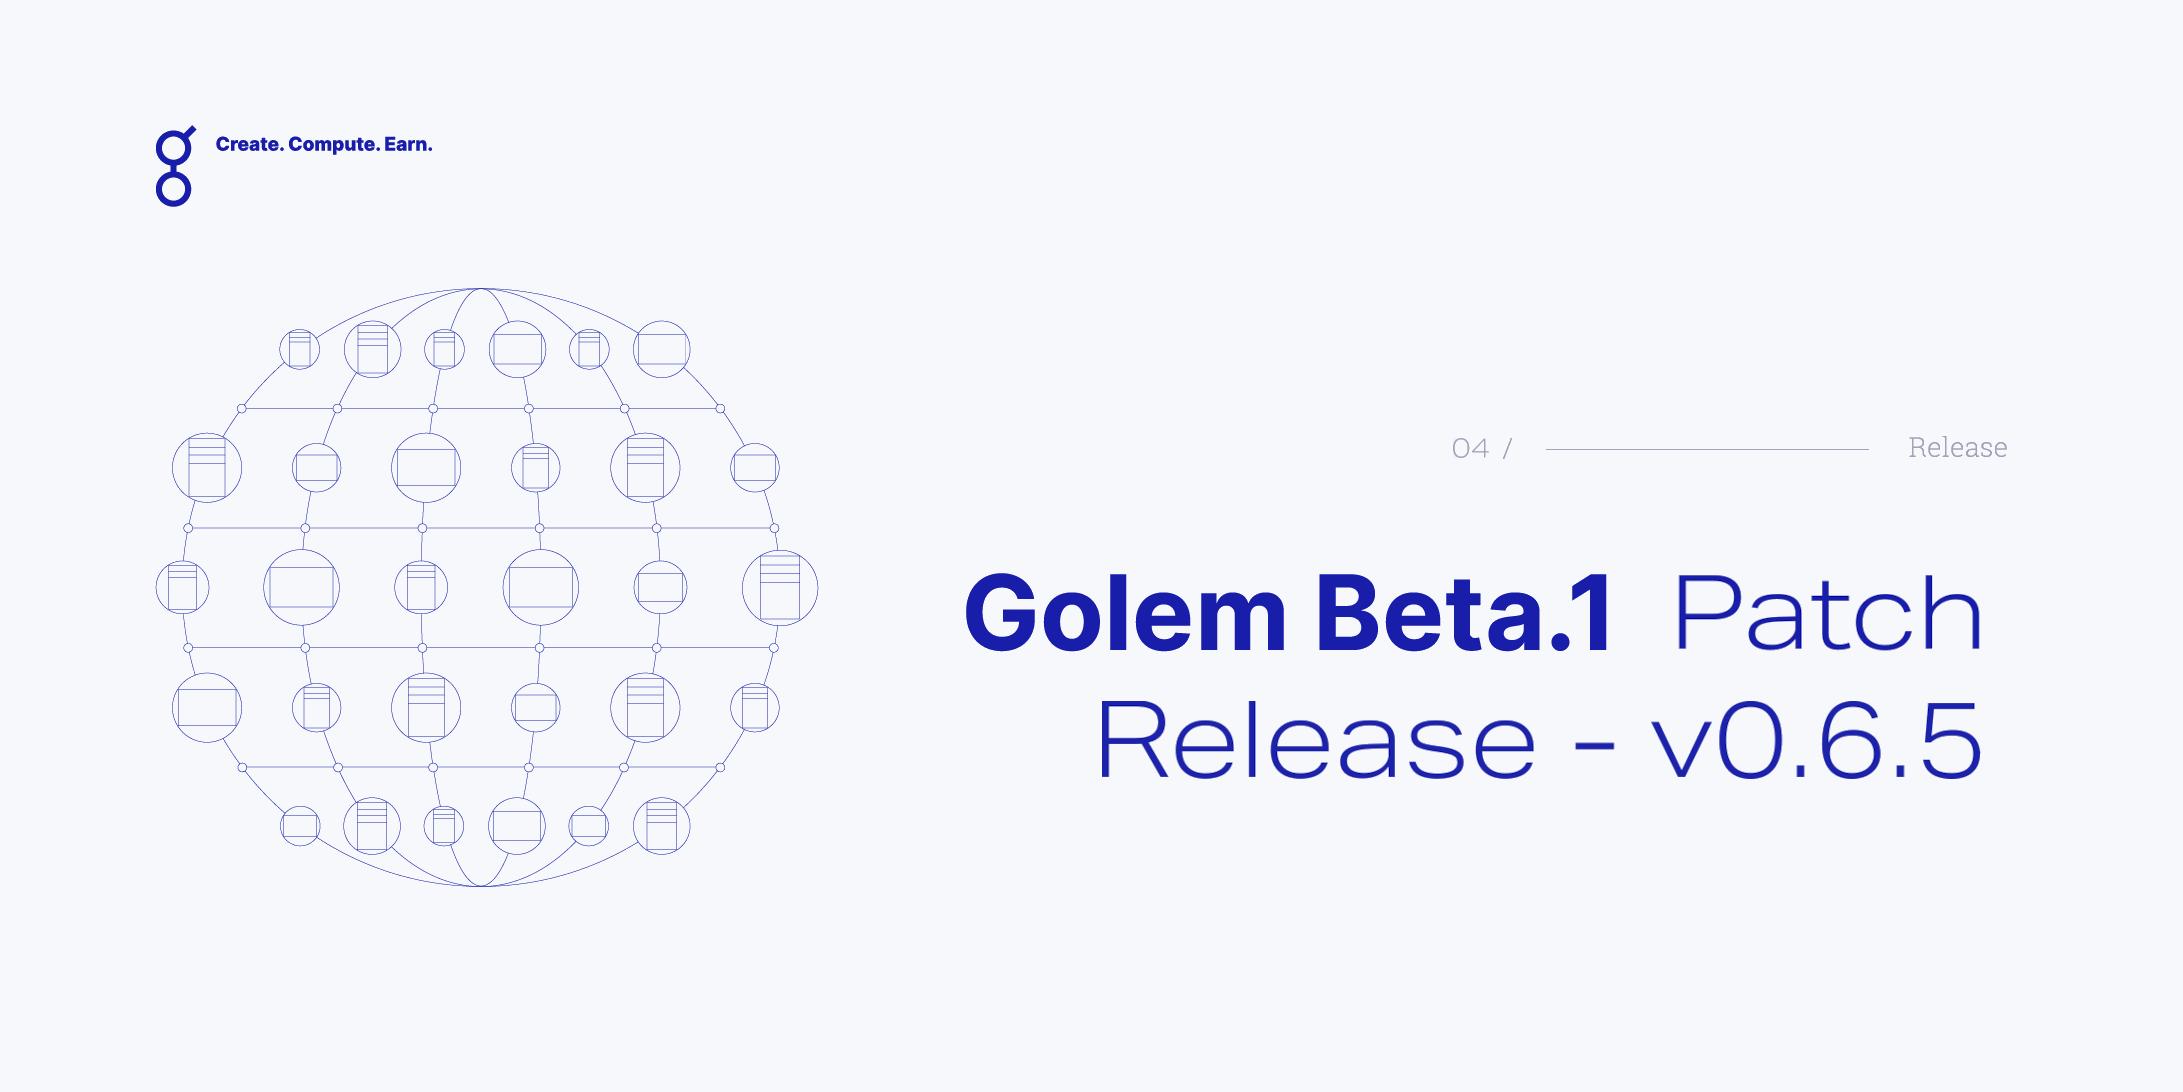 Golem Beta 1 Patch Release - v0.6.5